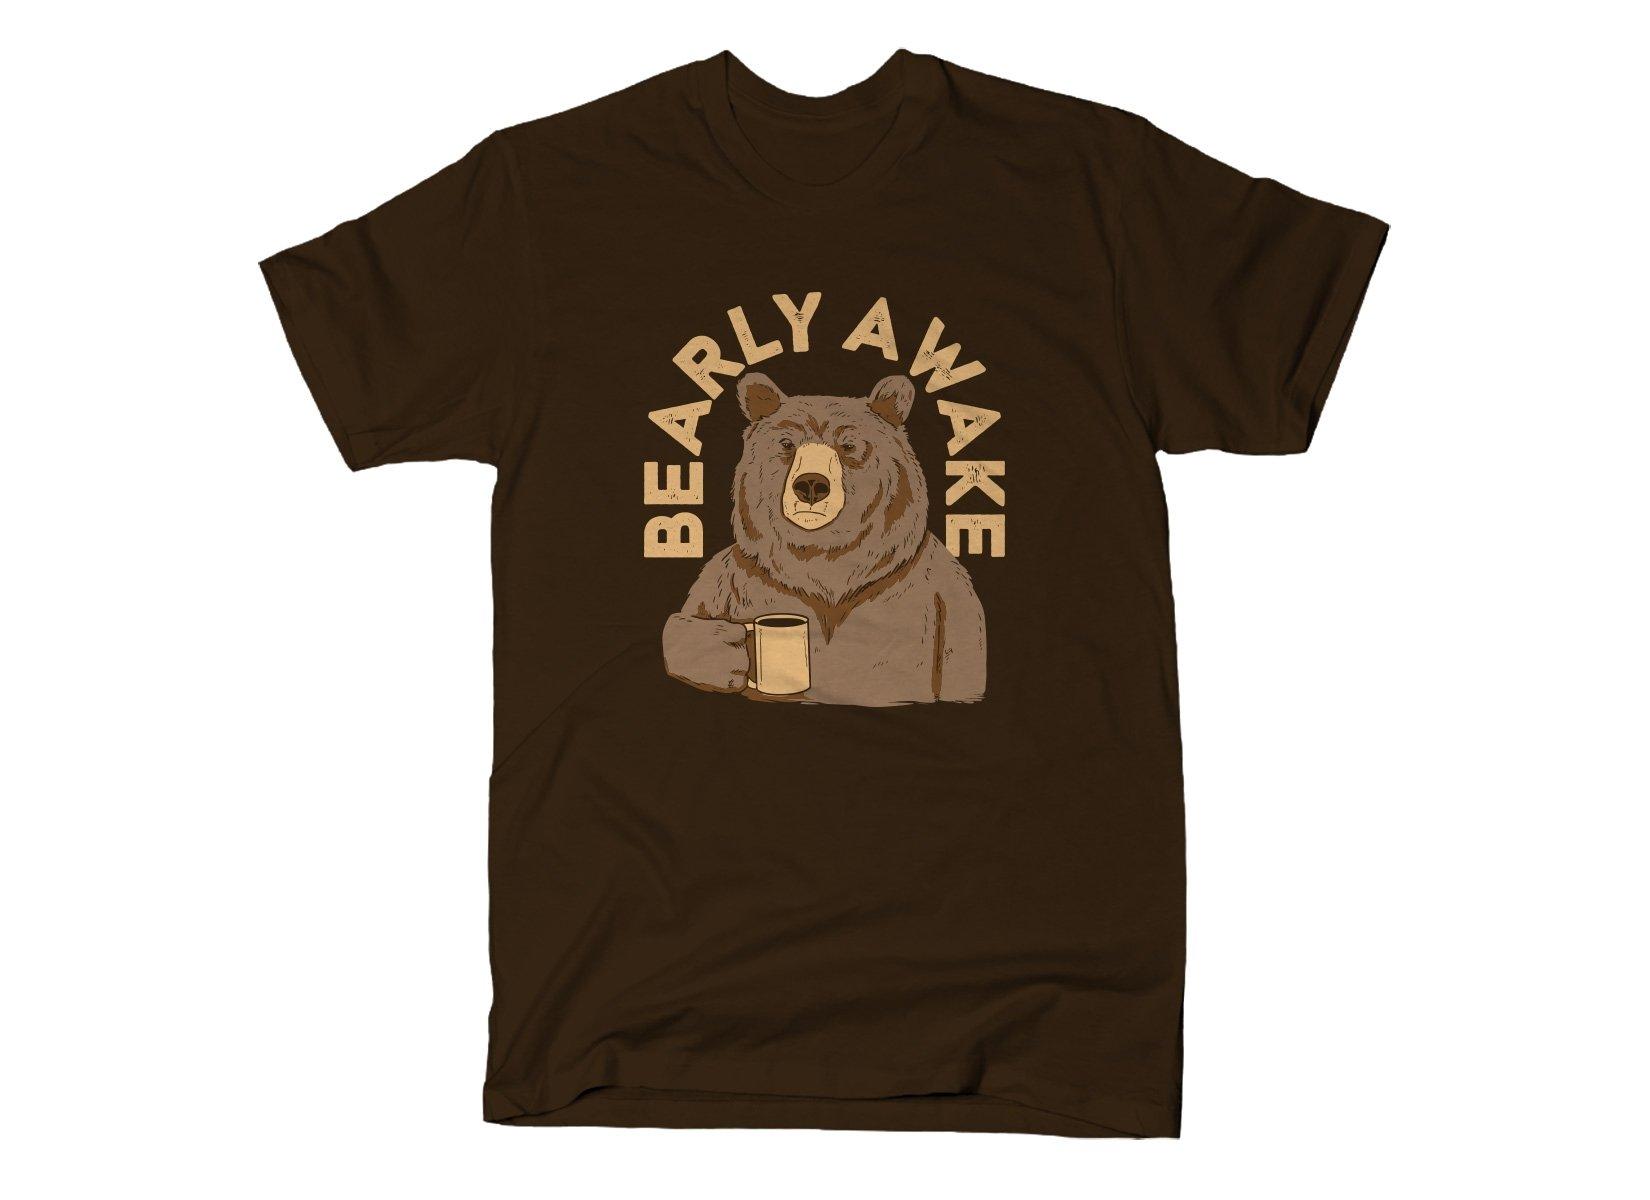 Bearly Awake on Mens T-Shirt